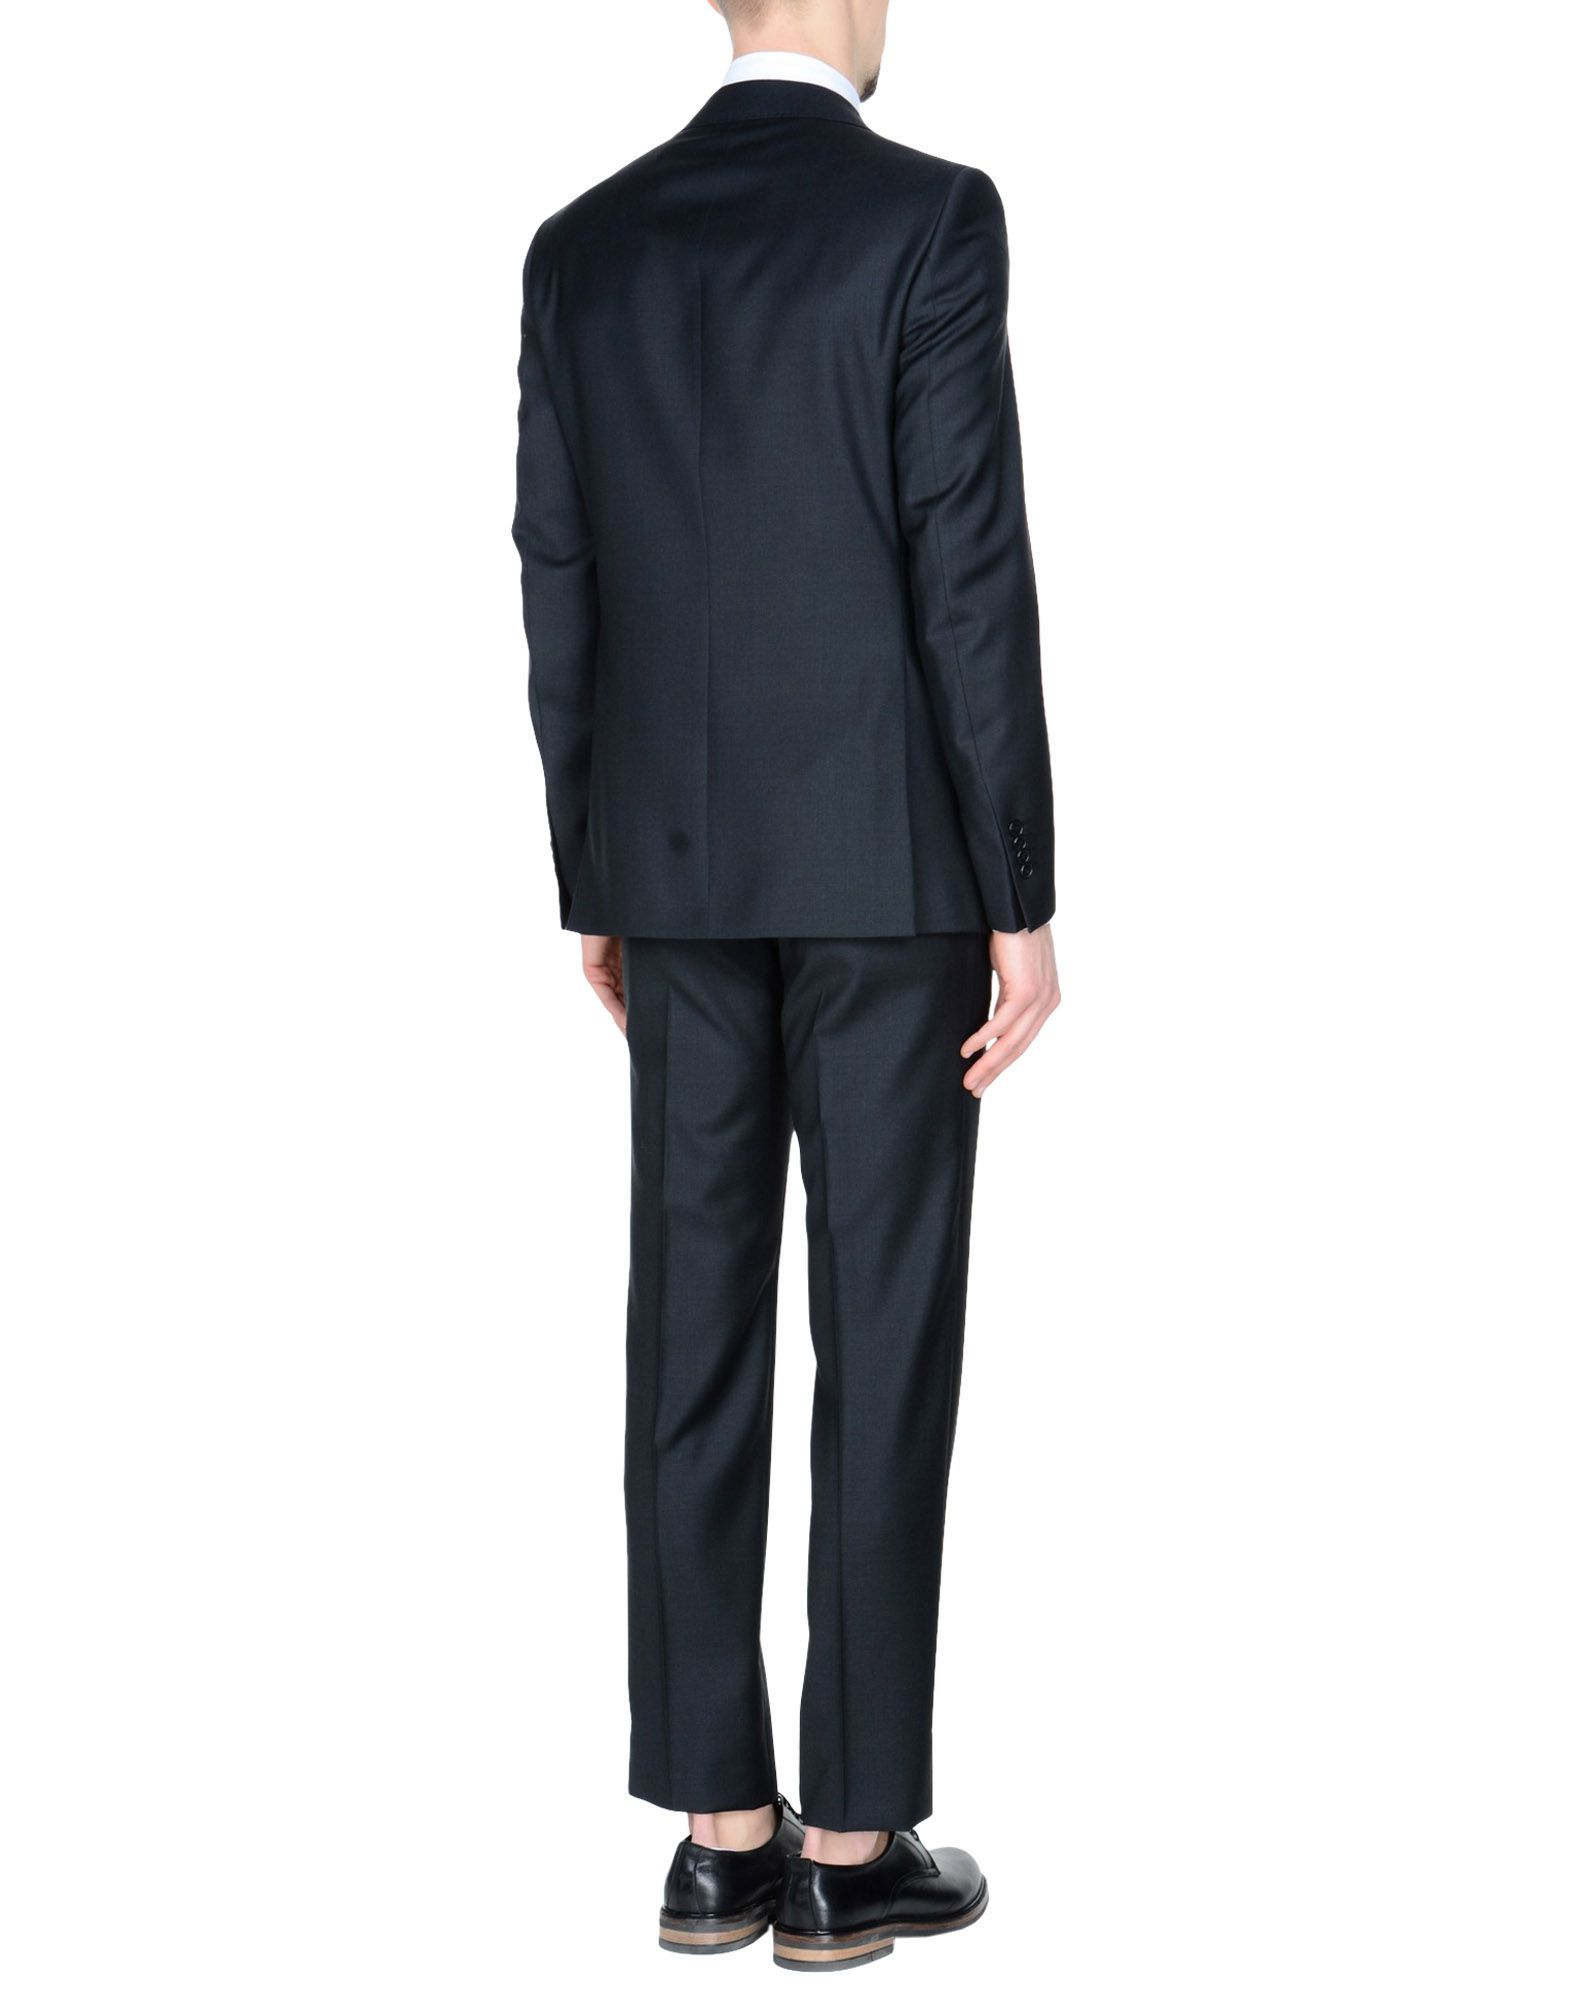 Tombolini Steel Grey Virgin Wool Single Breasted Suit